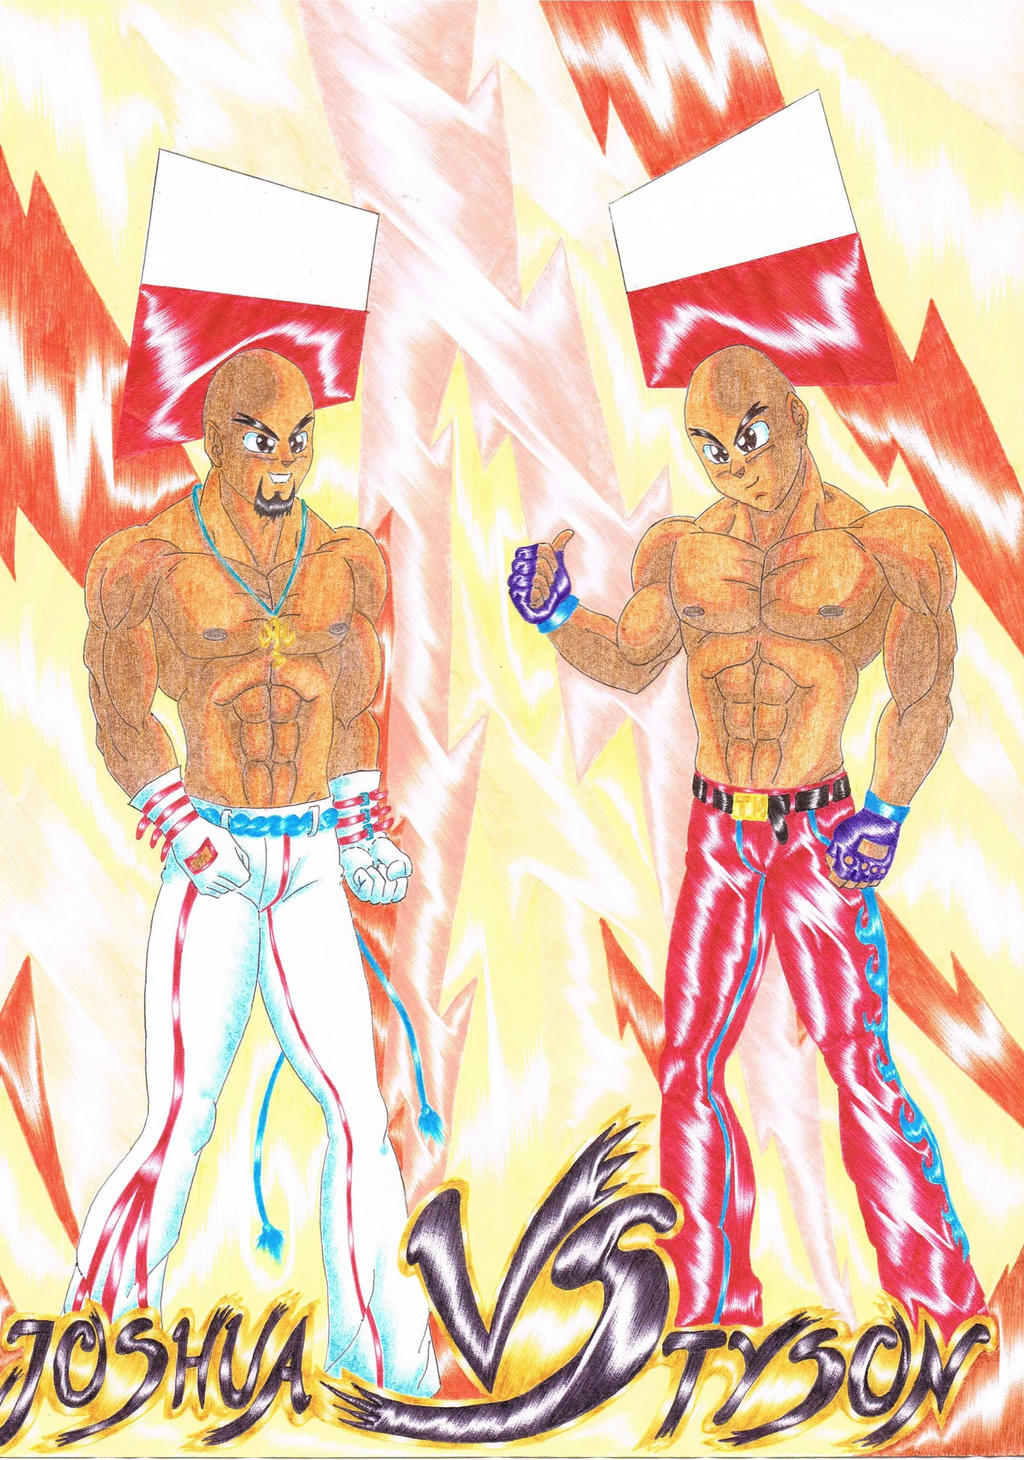 Joshua vs Tyson by LukaszMuzial